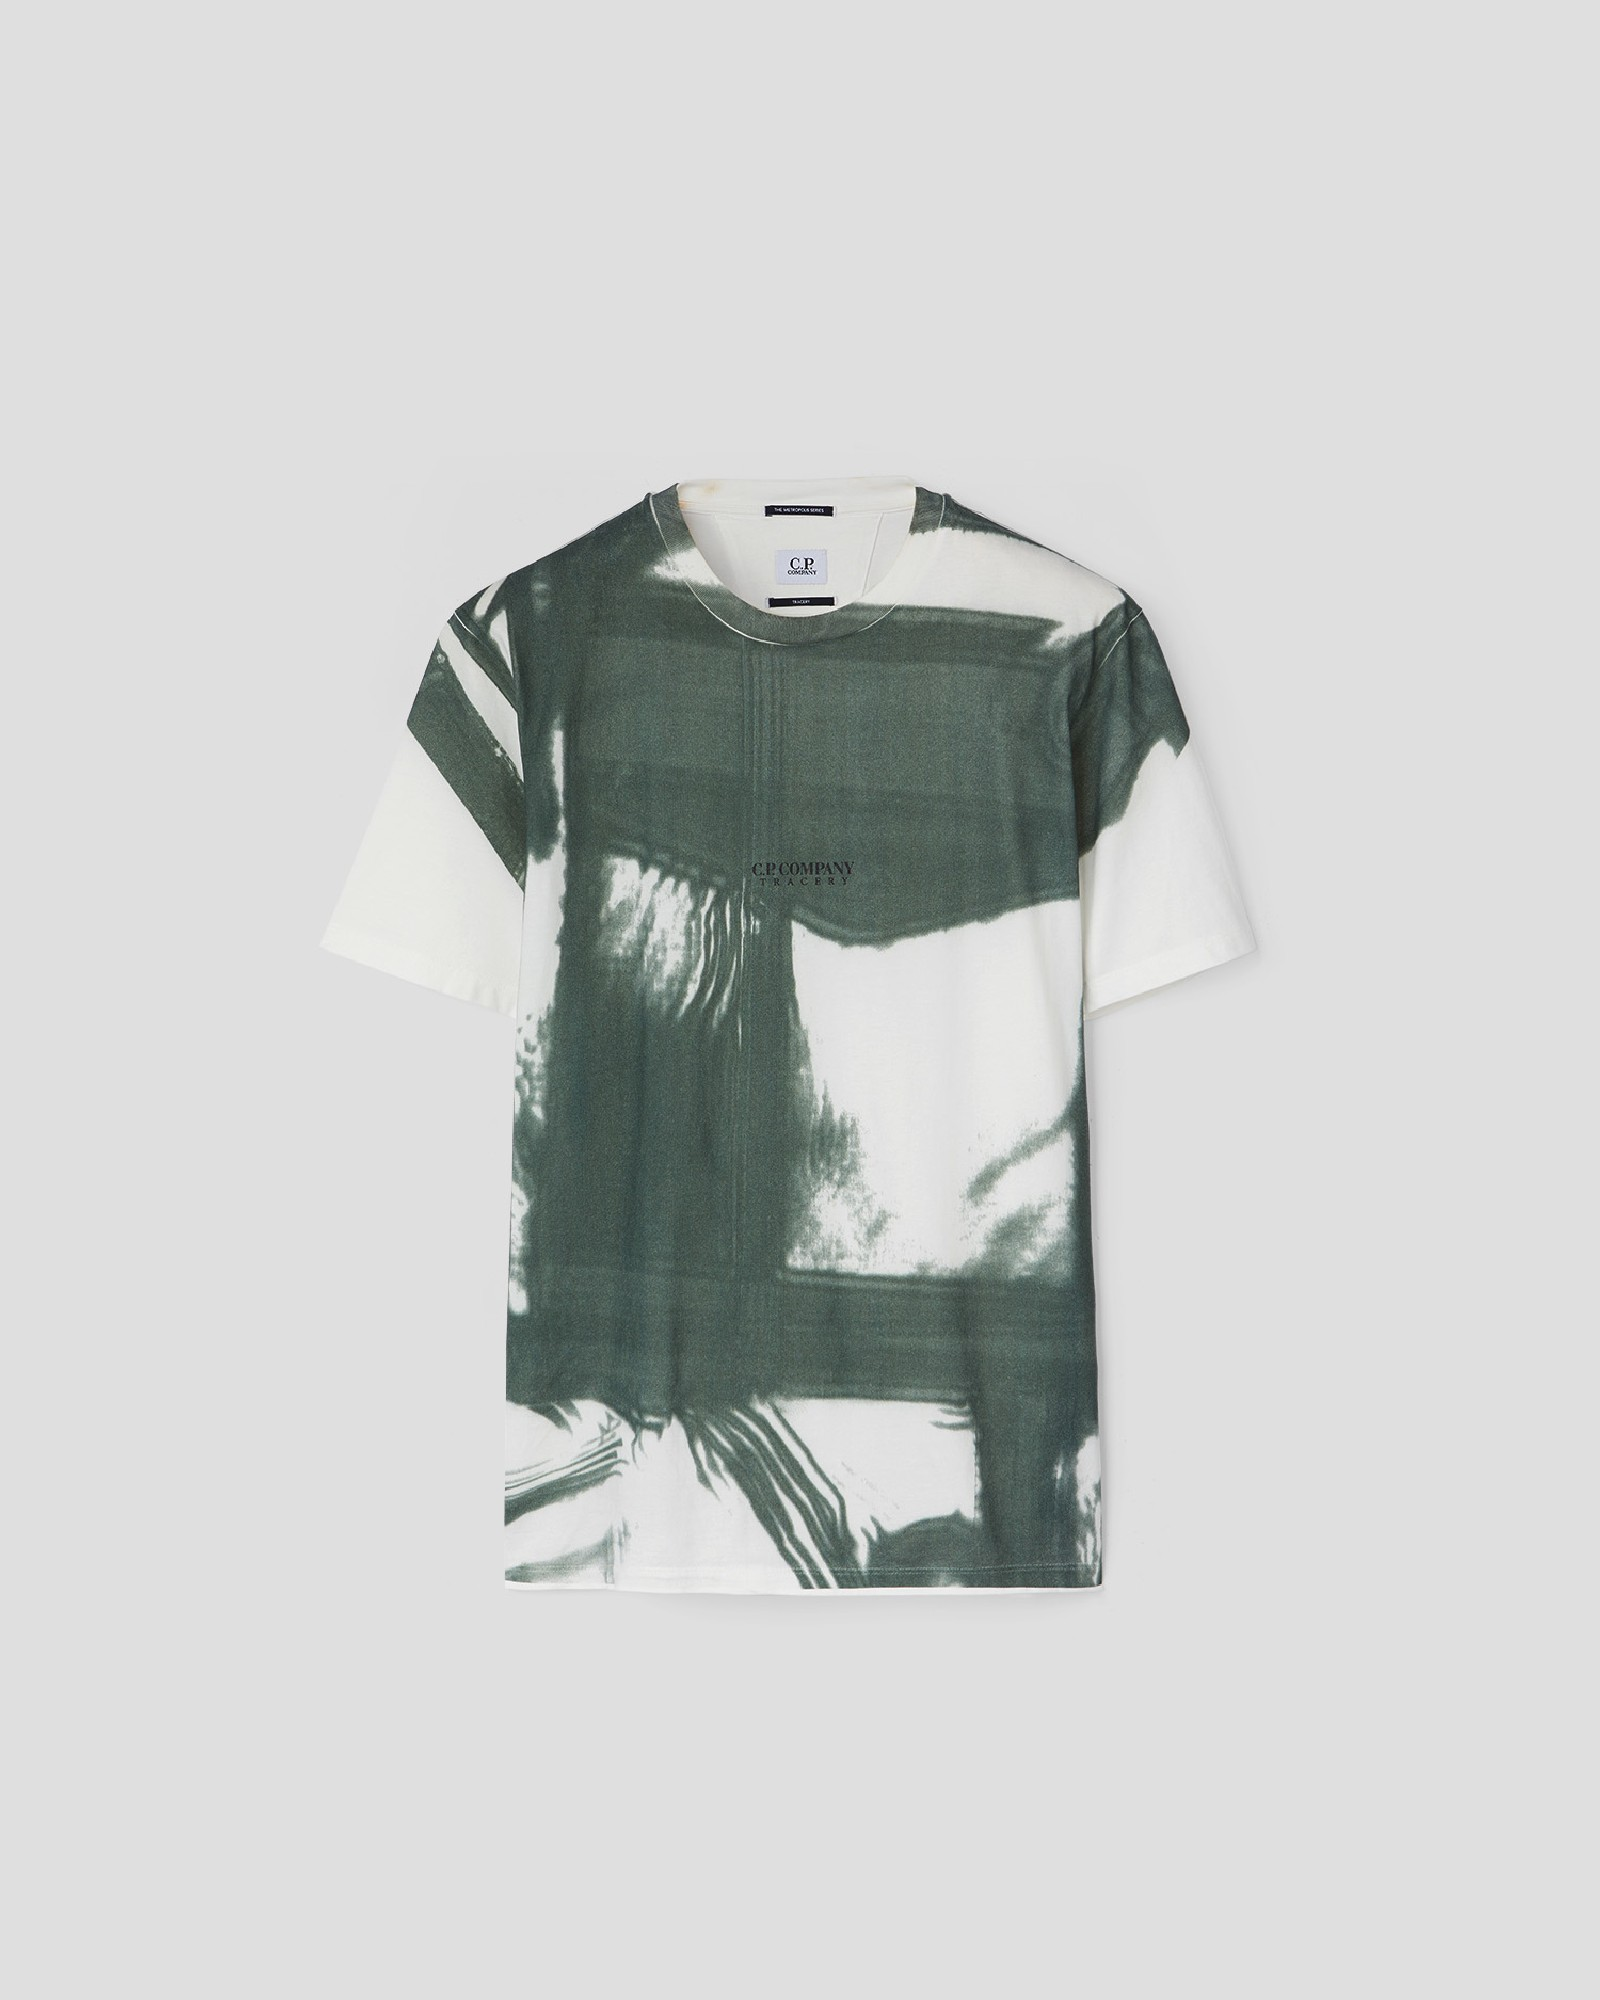 C.P. COMPANY | T-shirt | MTS201A00 5621P668